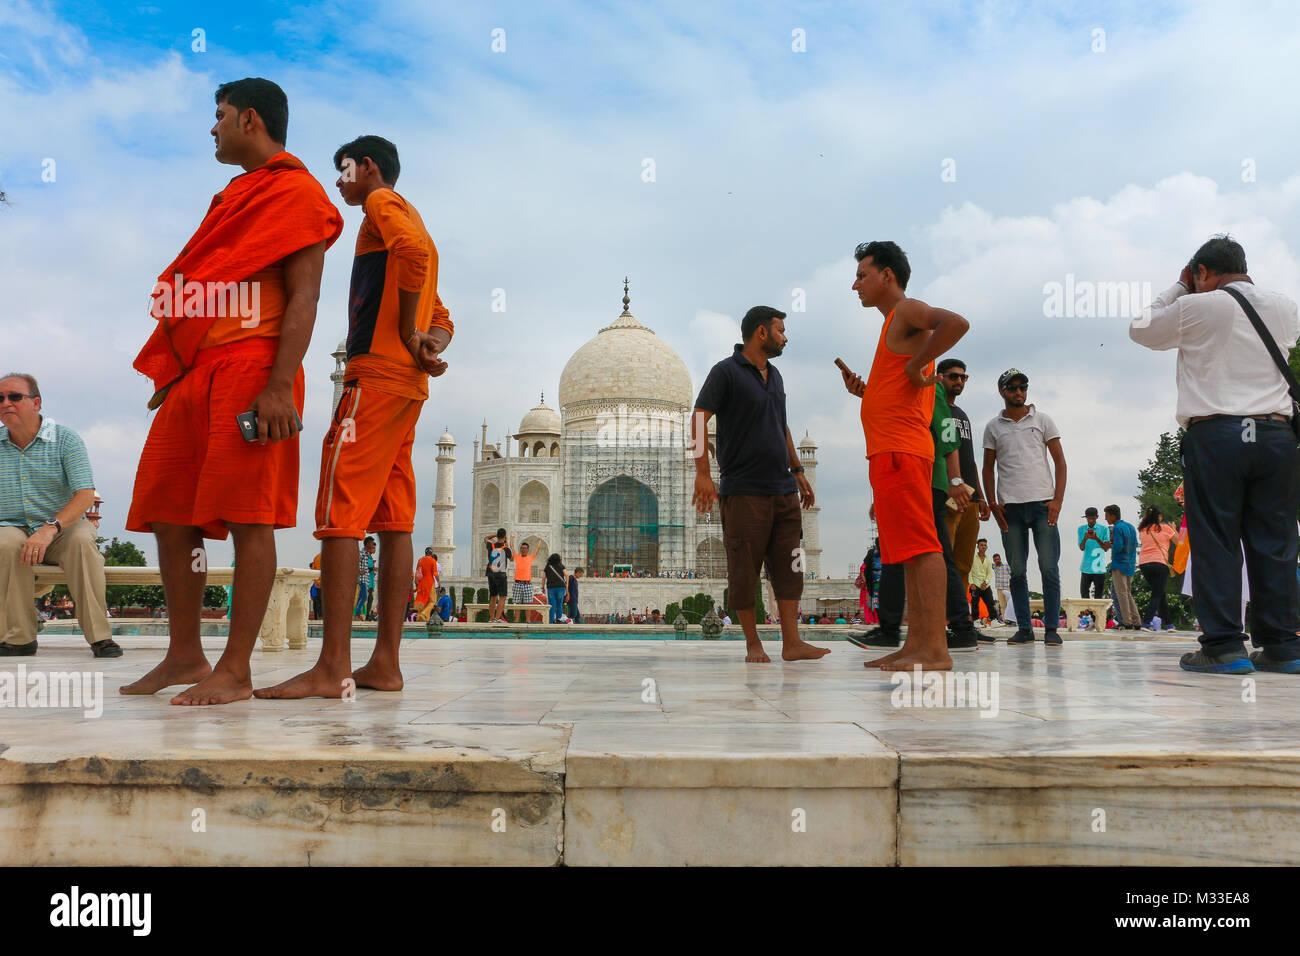 Taj Mahal Palace, Agra, Uttar Pradesh, India Imagen De Stock